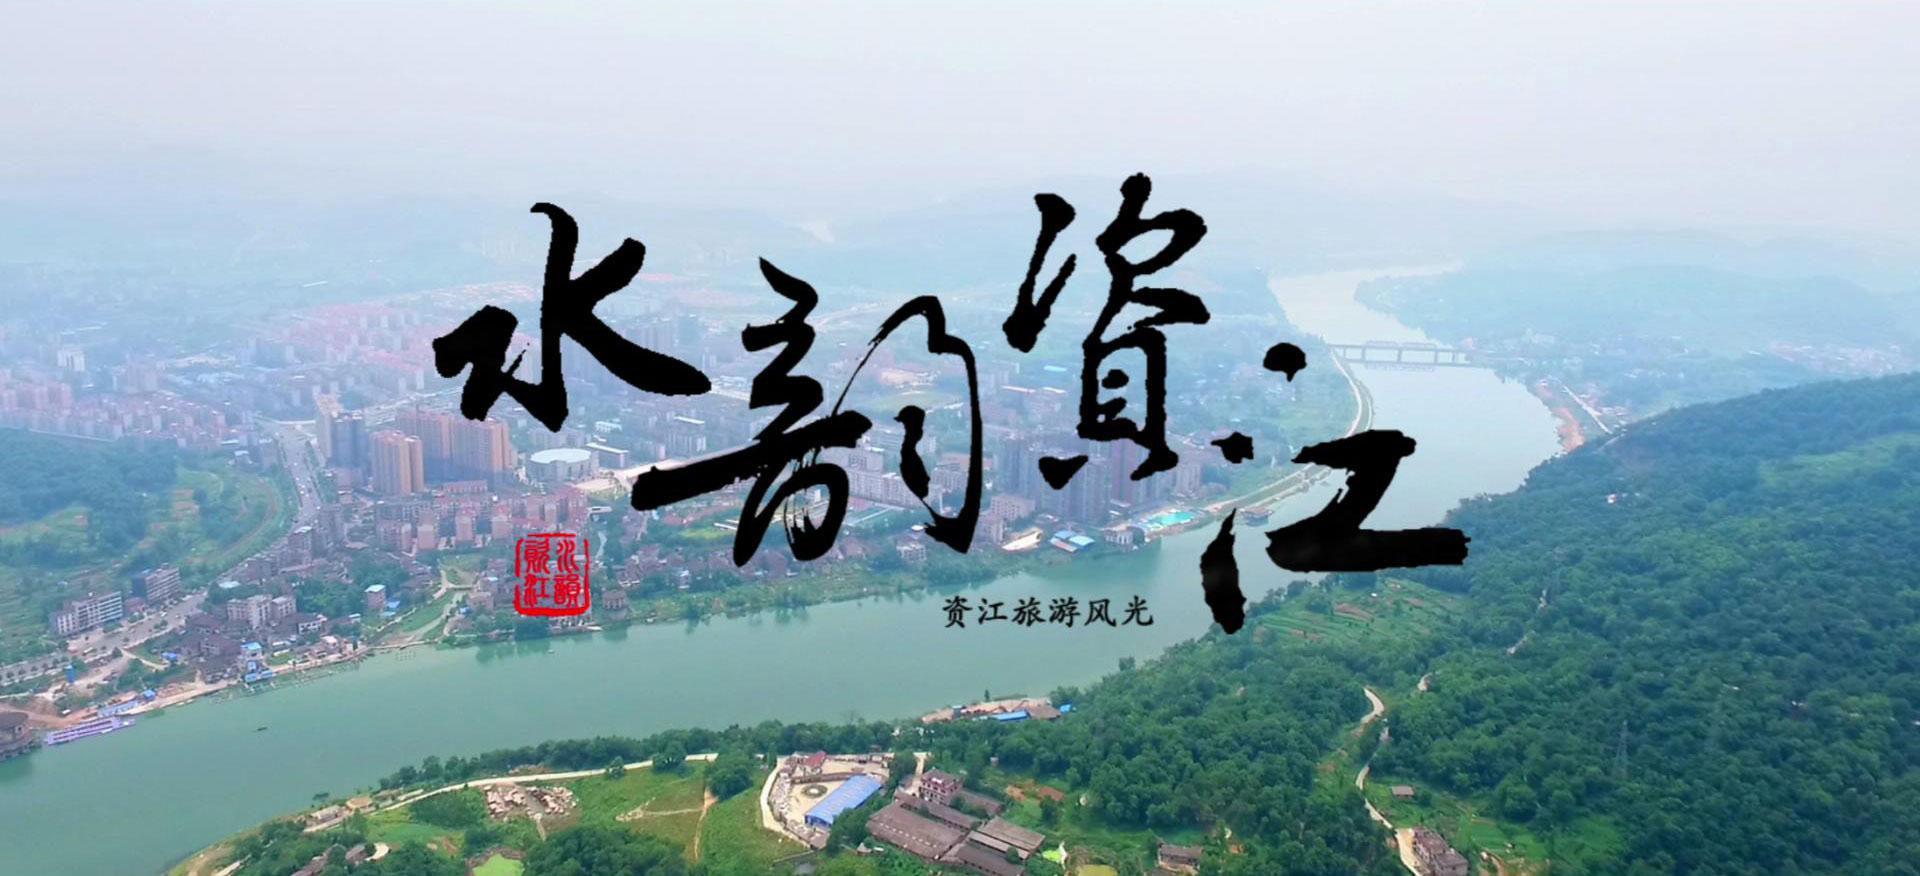 WaterRhyme-zijiang